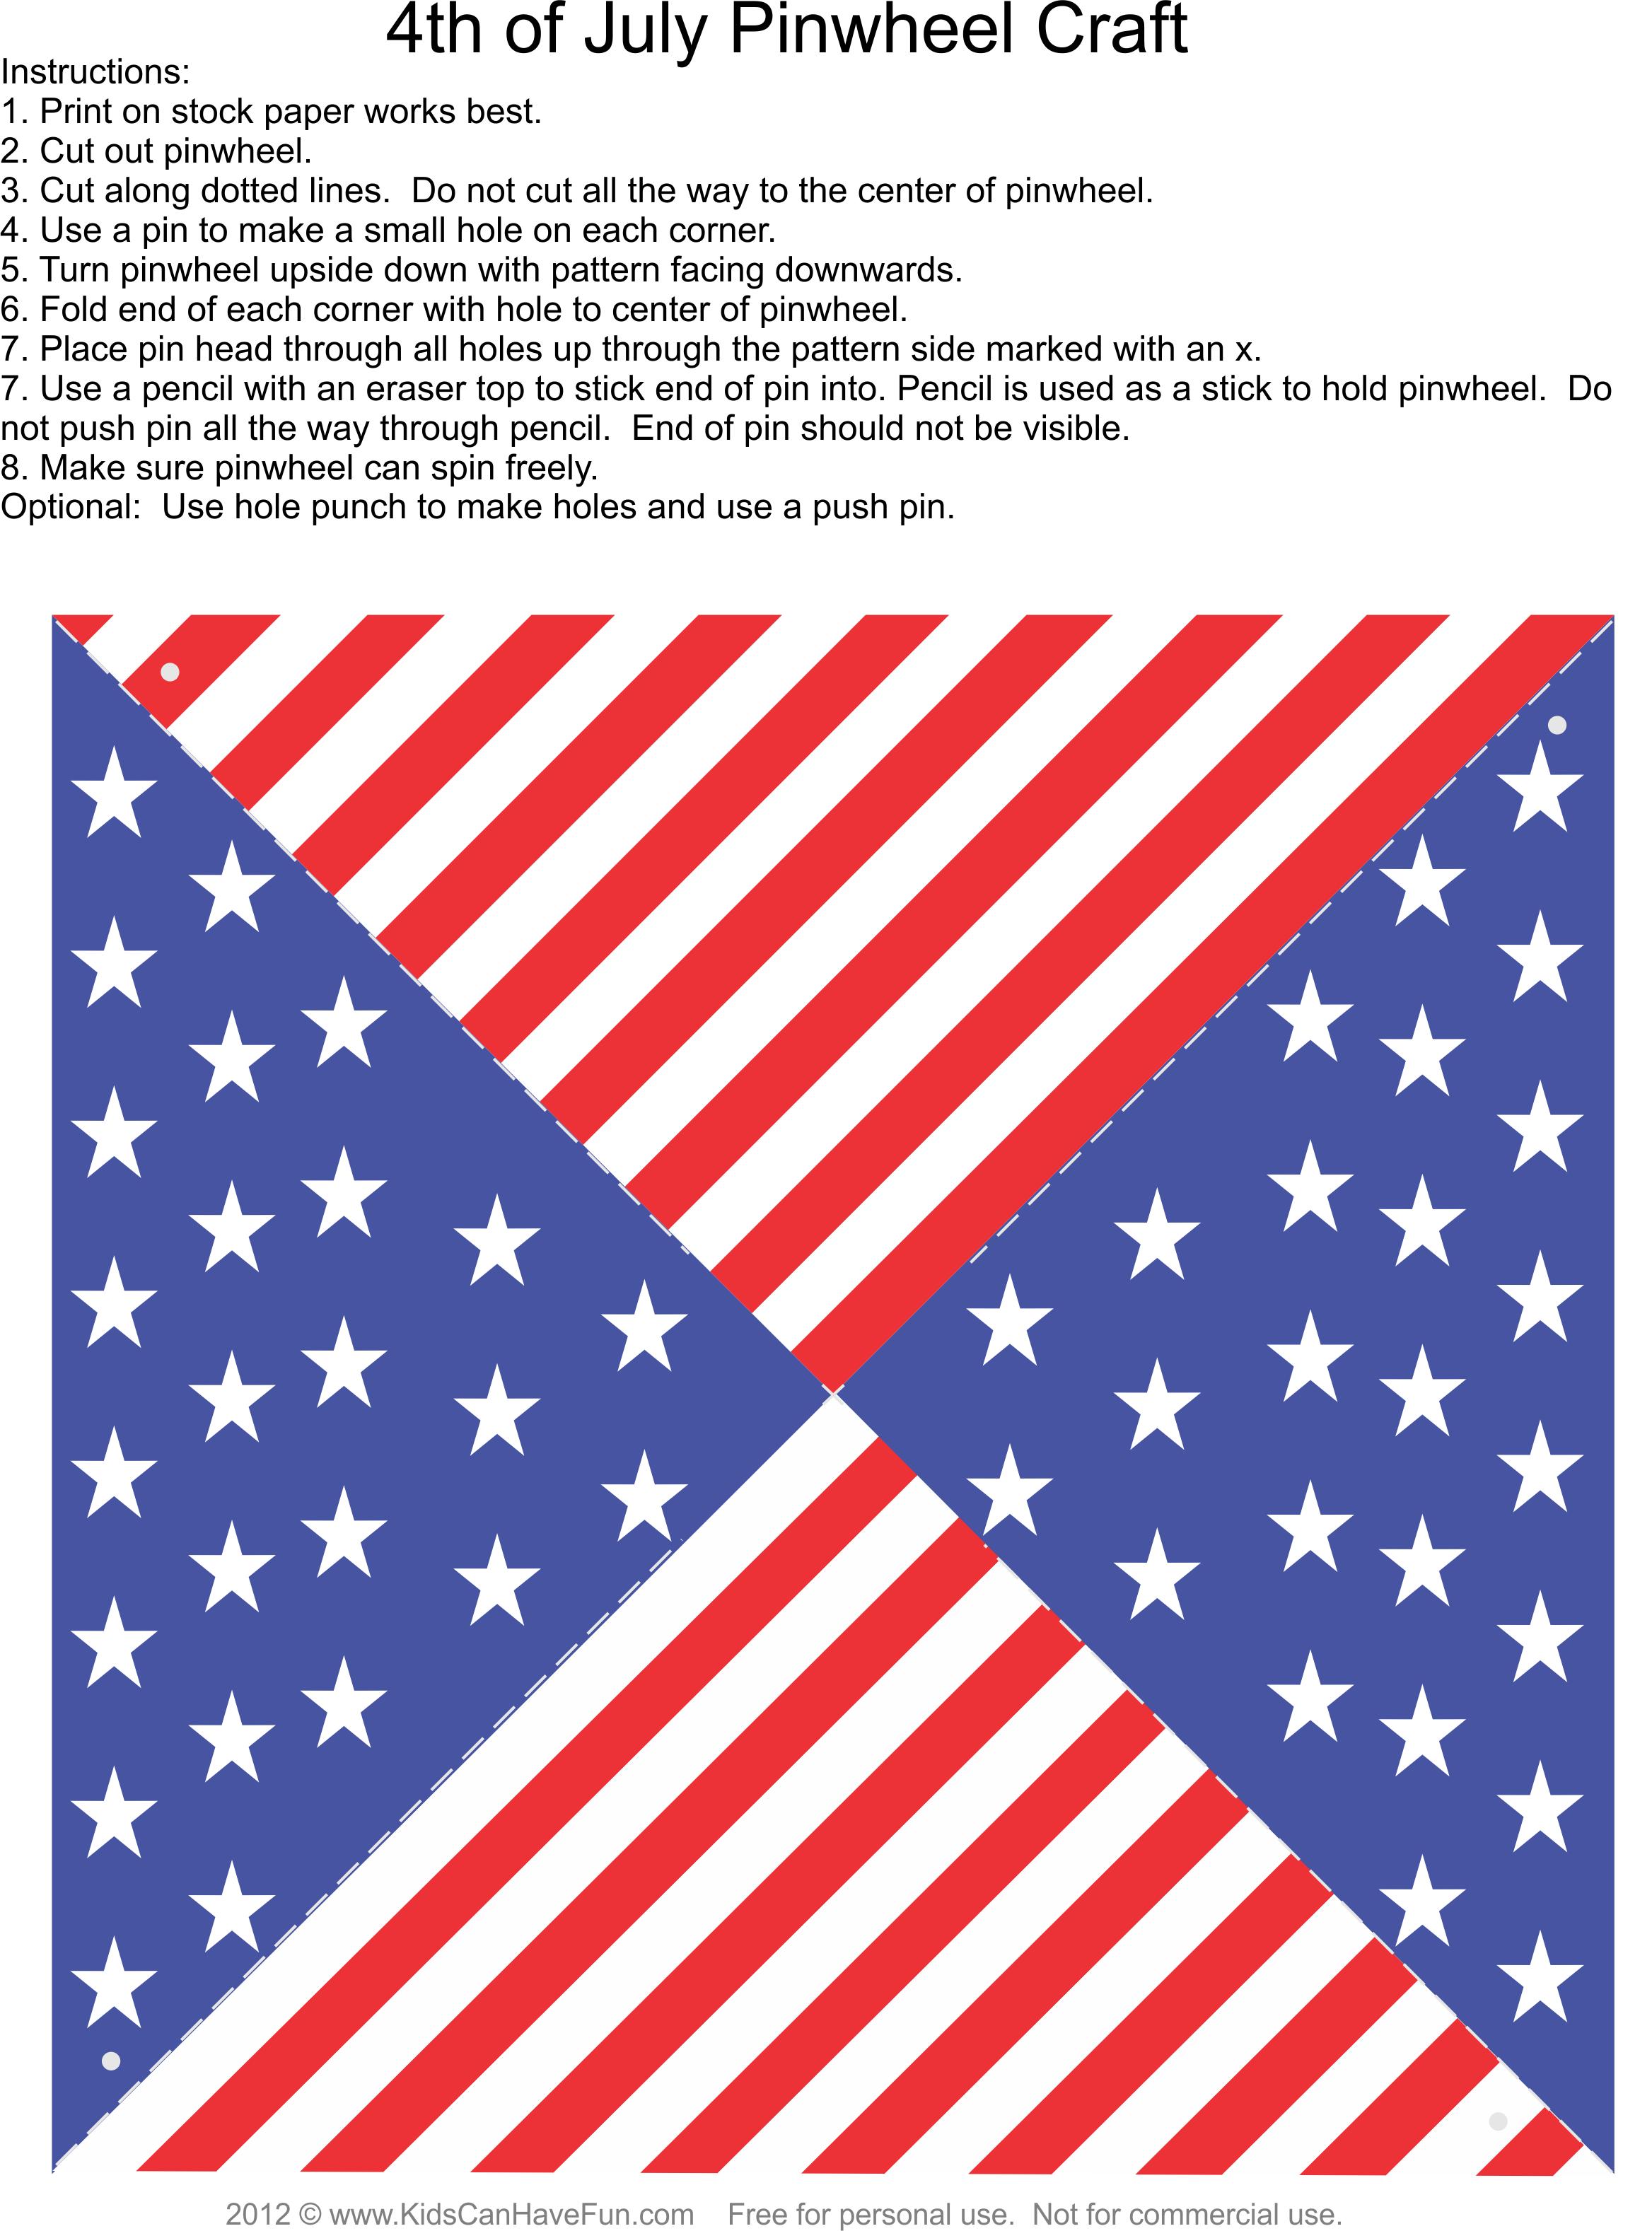 4th Of July Pinwheel Craft 4thofjuly Independanceday